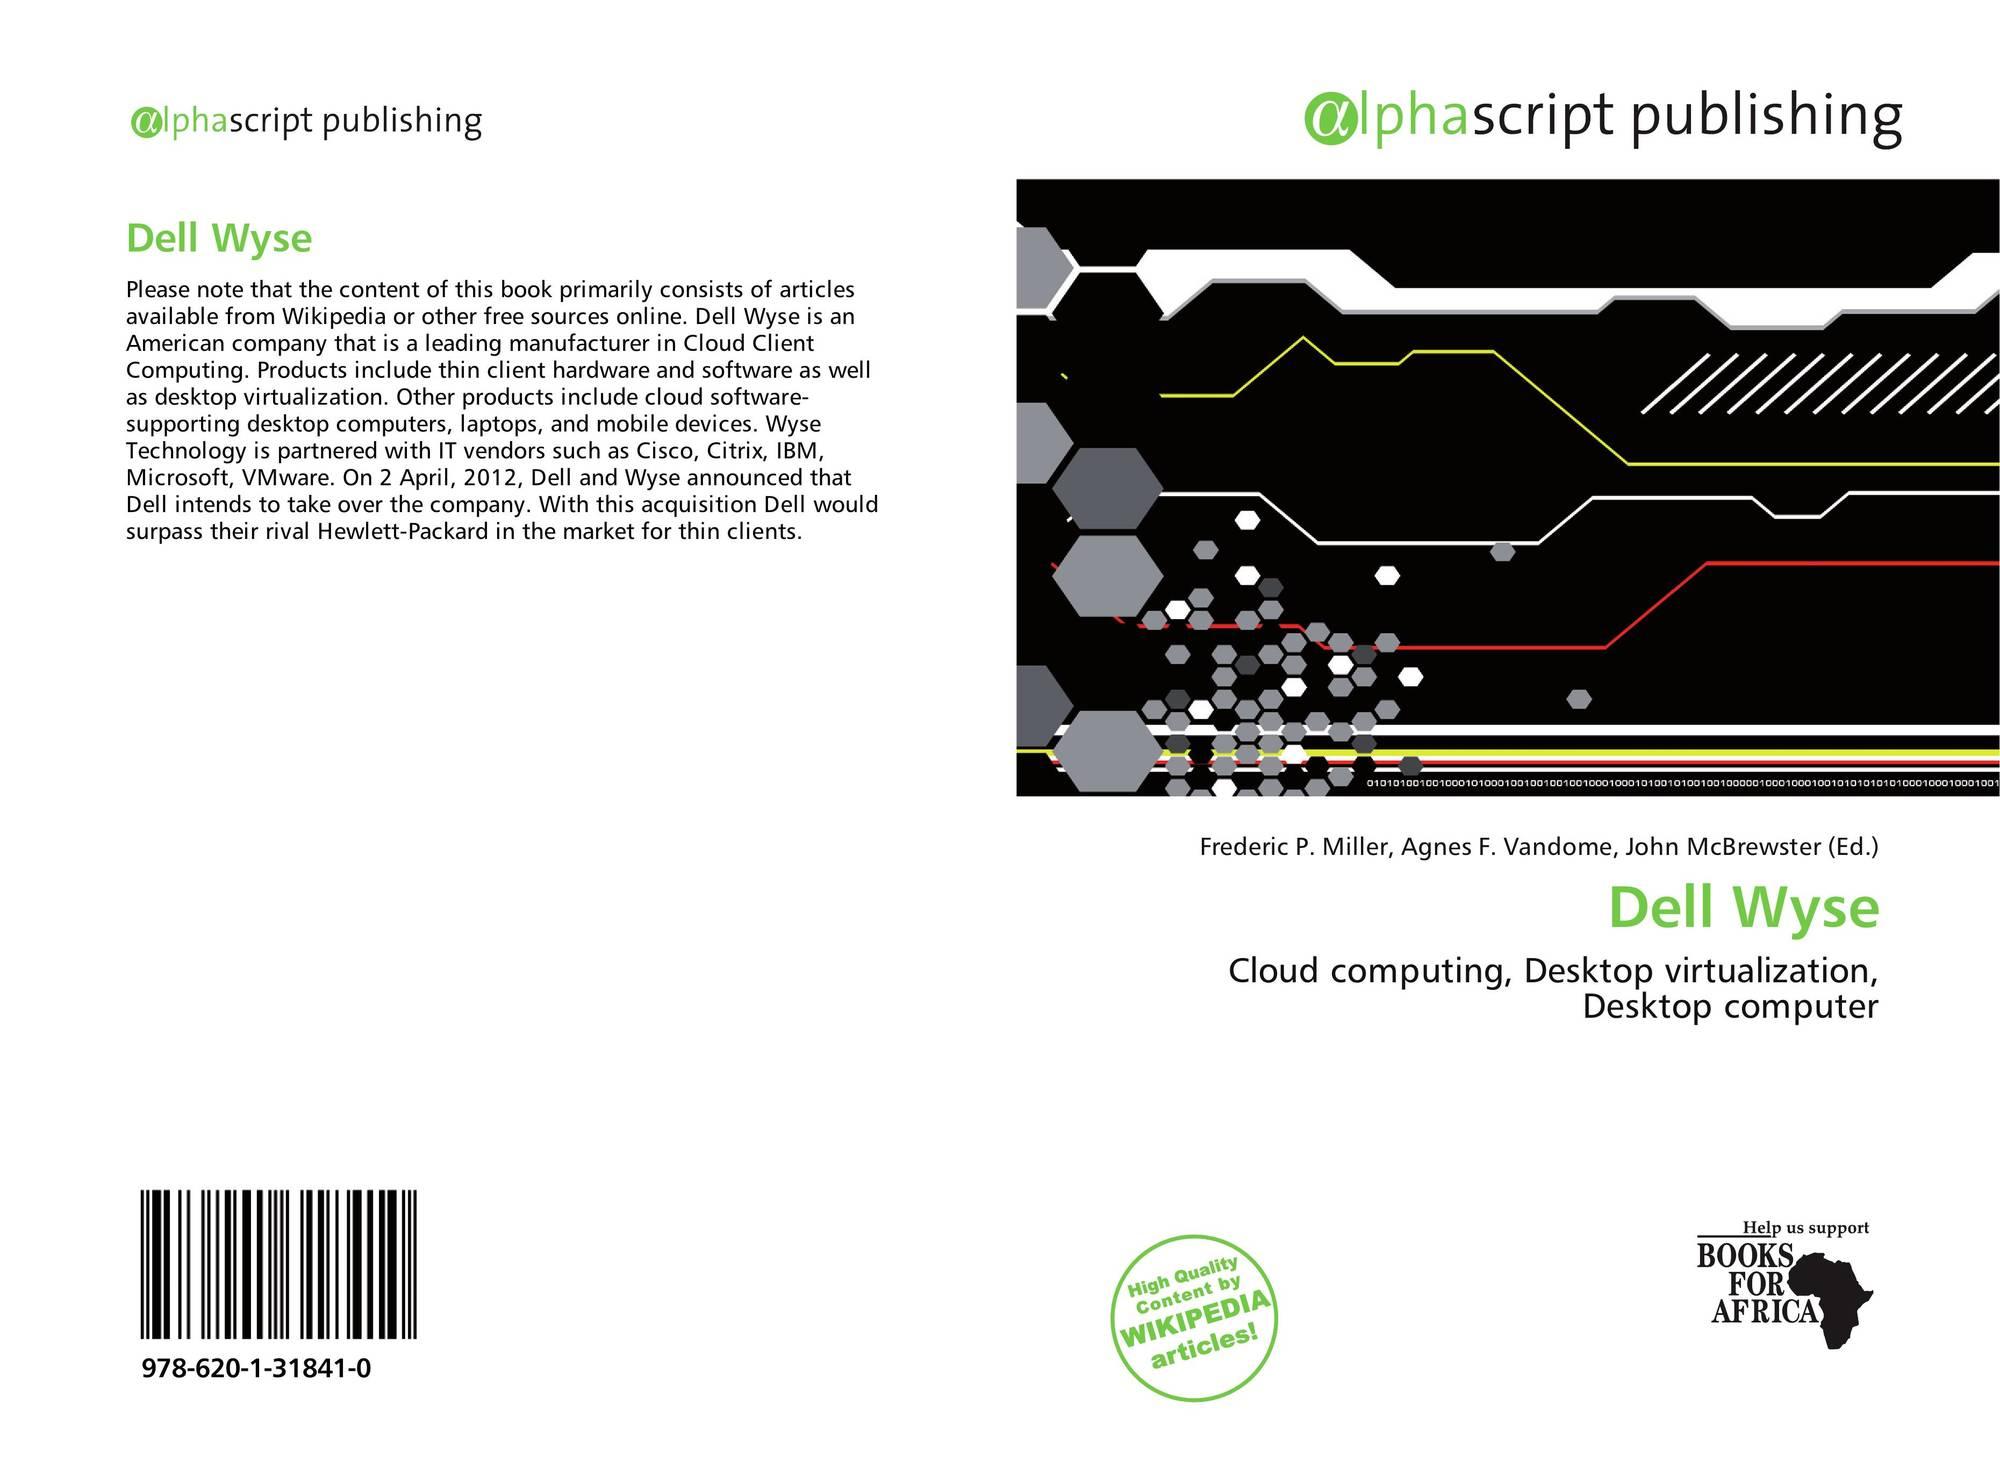 Dell Wyse, 978-620-1-31841-0, 6201318410 ,9786201318410